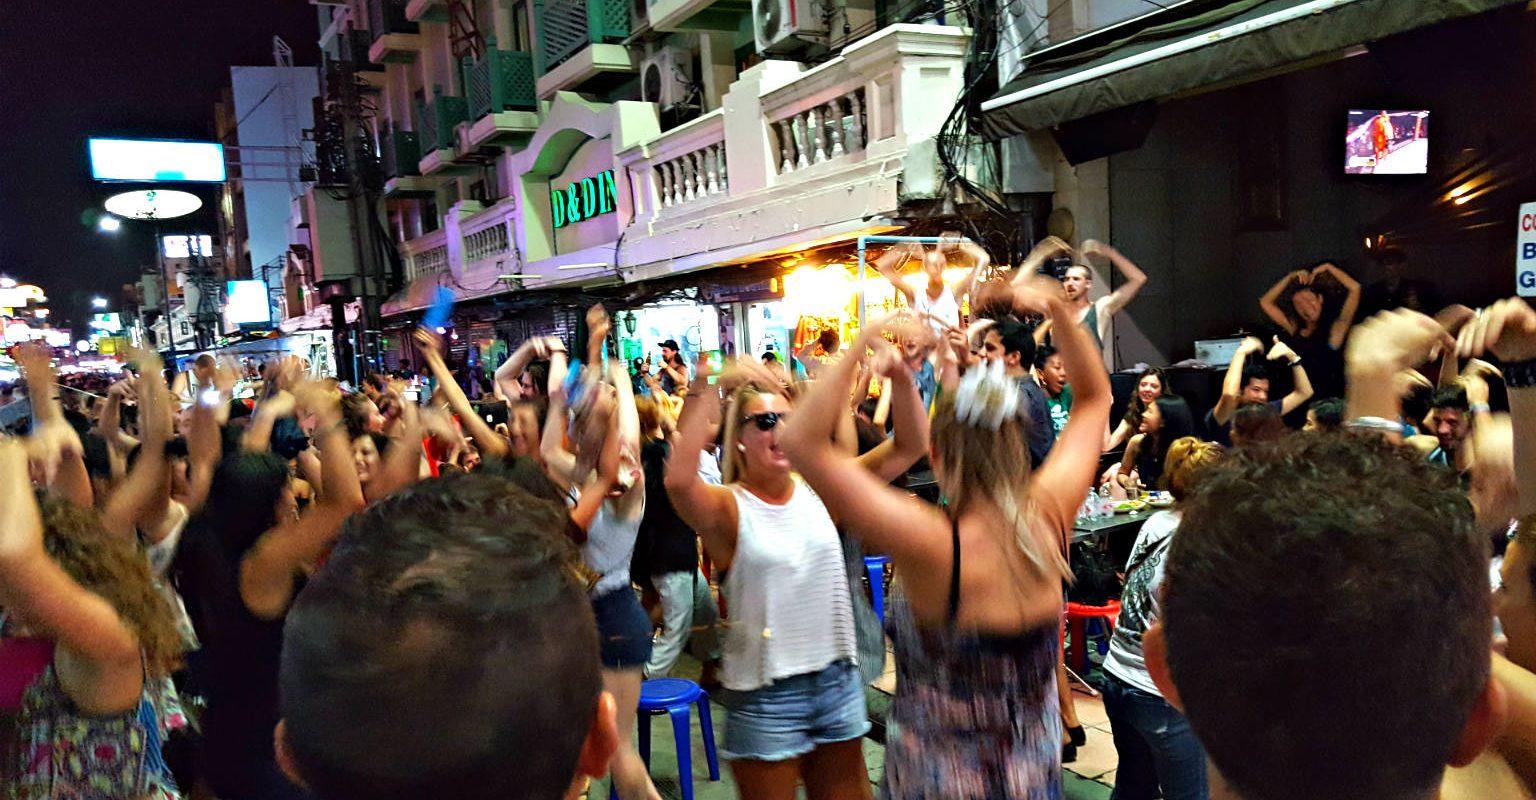 Khao San Road, de backpacker straat van Bangkok, mensen dansen de Macarena, Bangkok